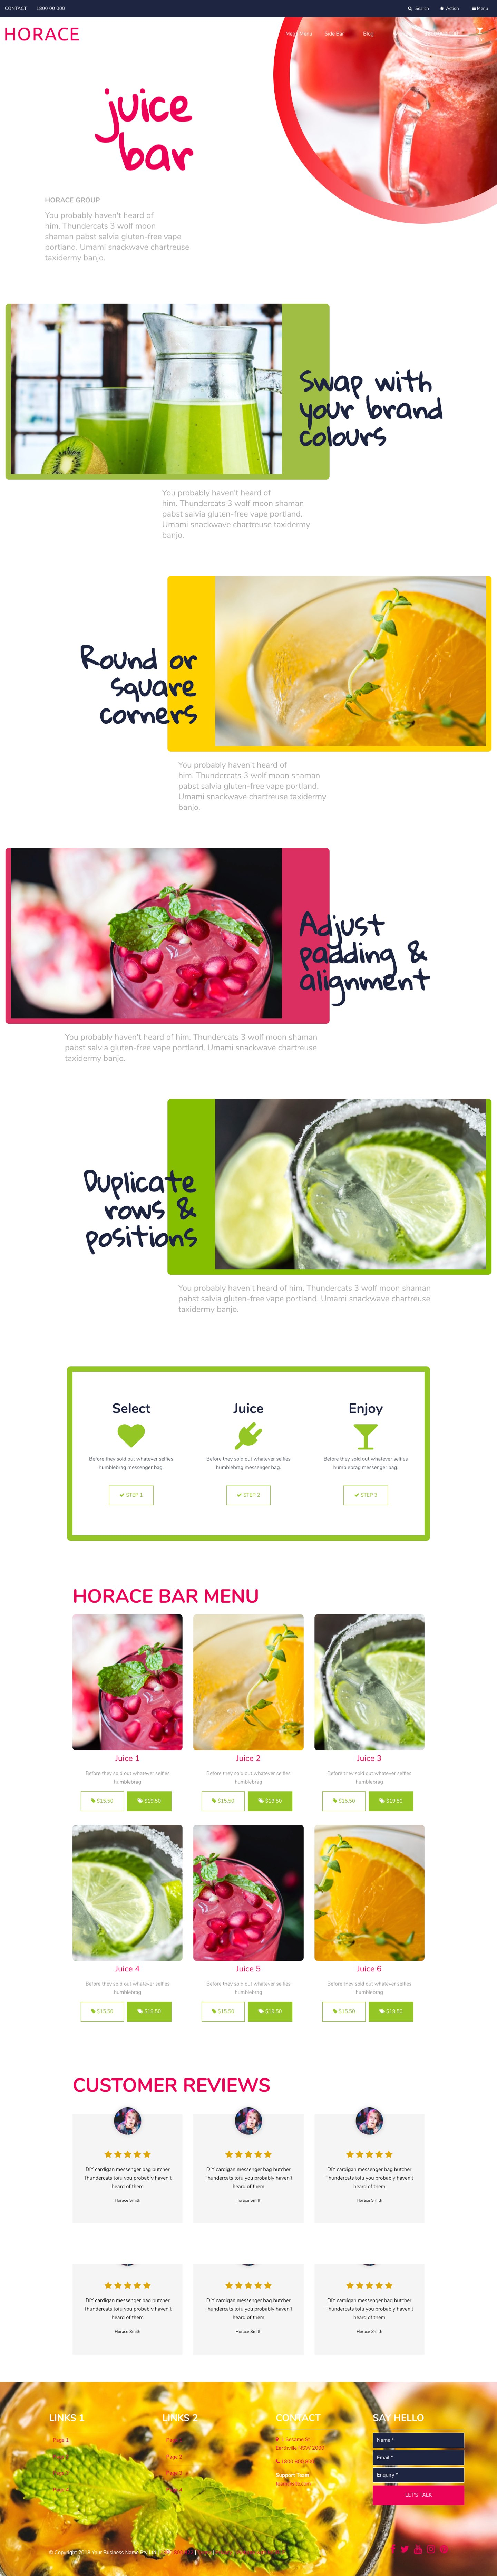 Horace Website